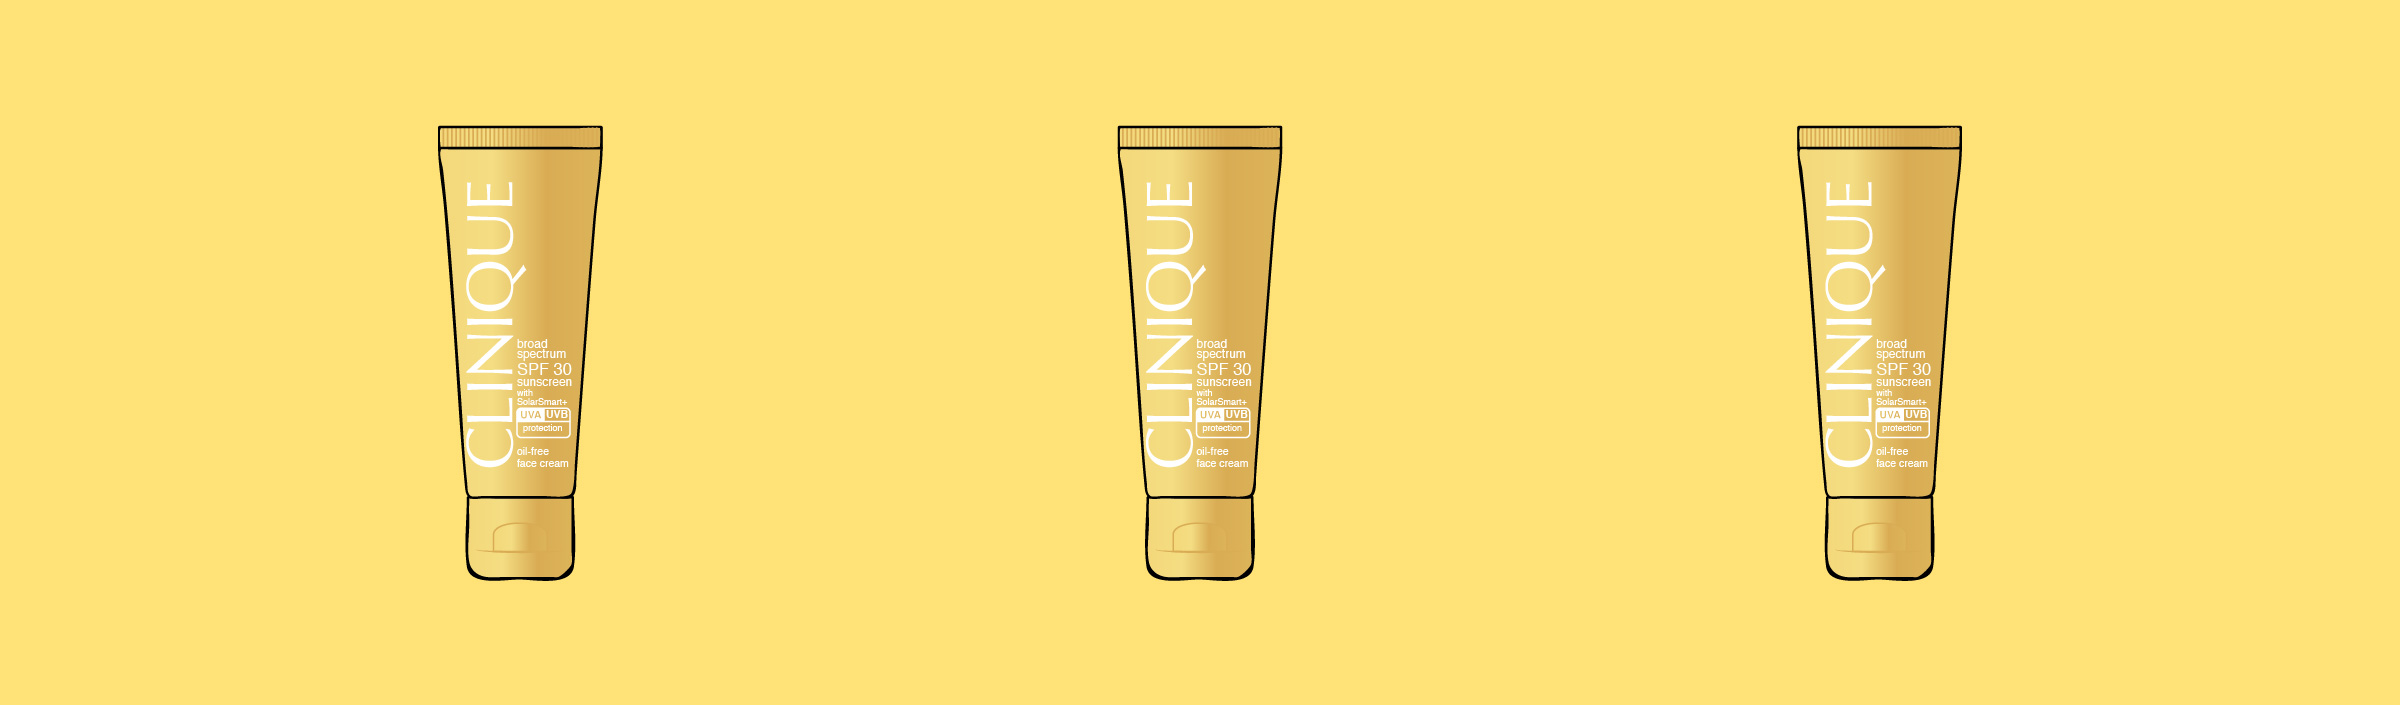 Clinique Oil Free UV Face Cream Review.jpg